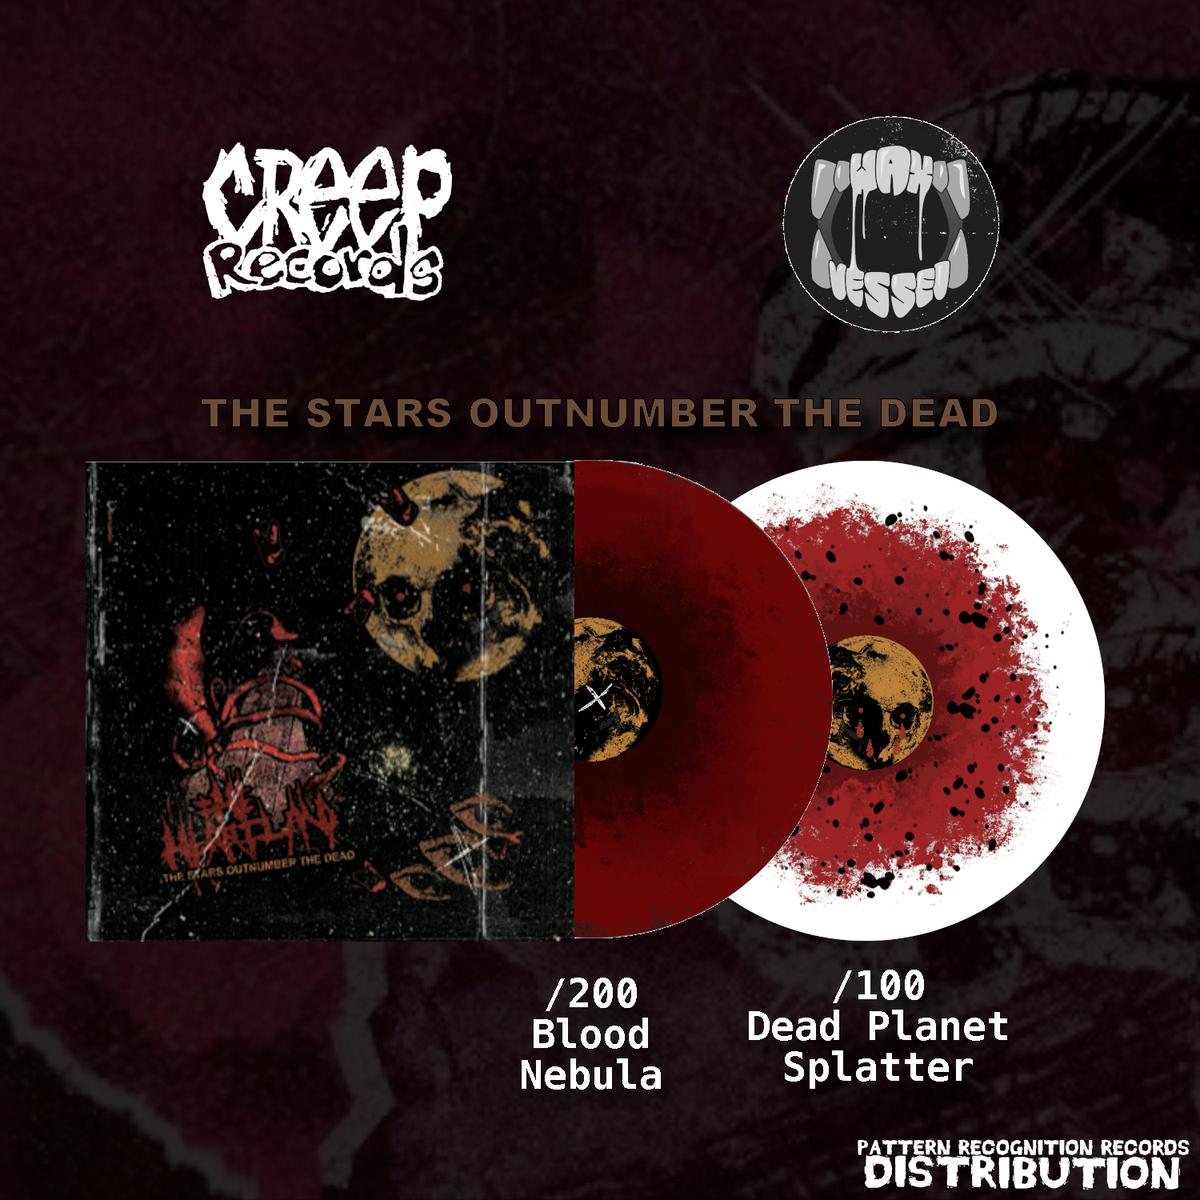 The Heartland Finally on Vinyl!